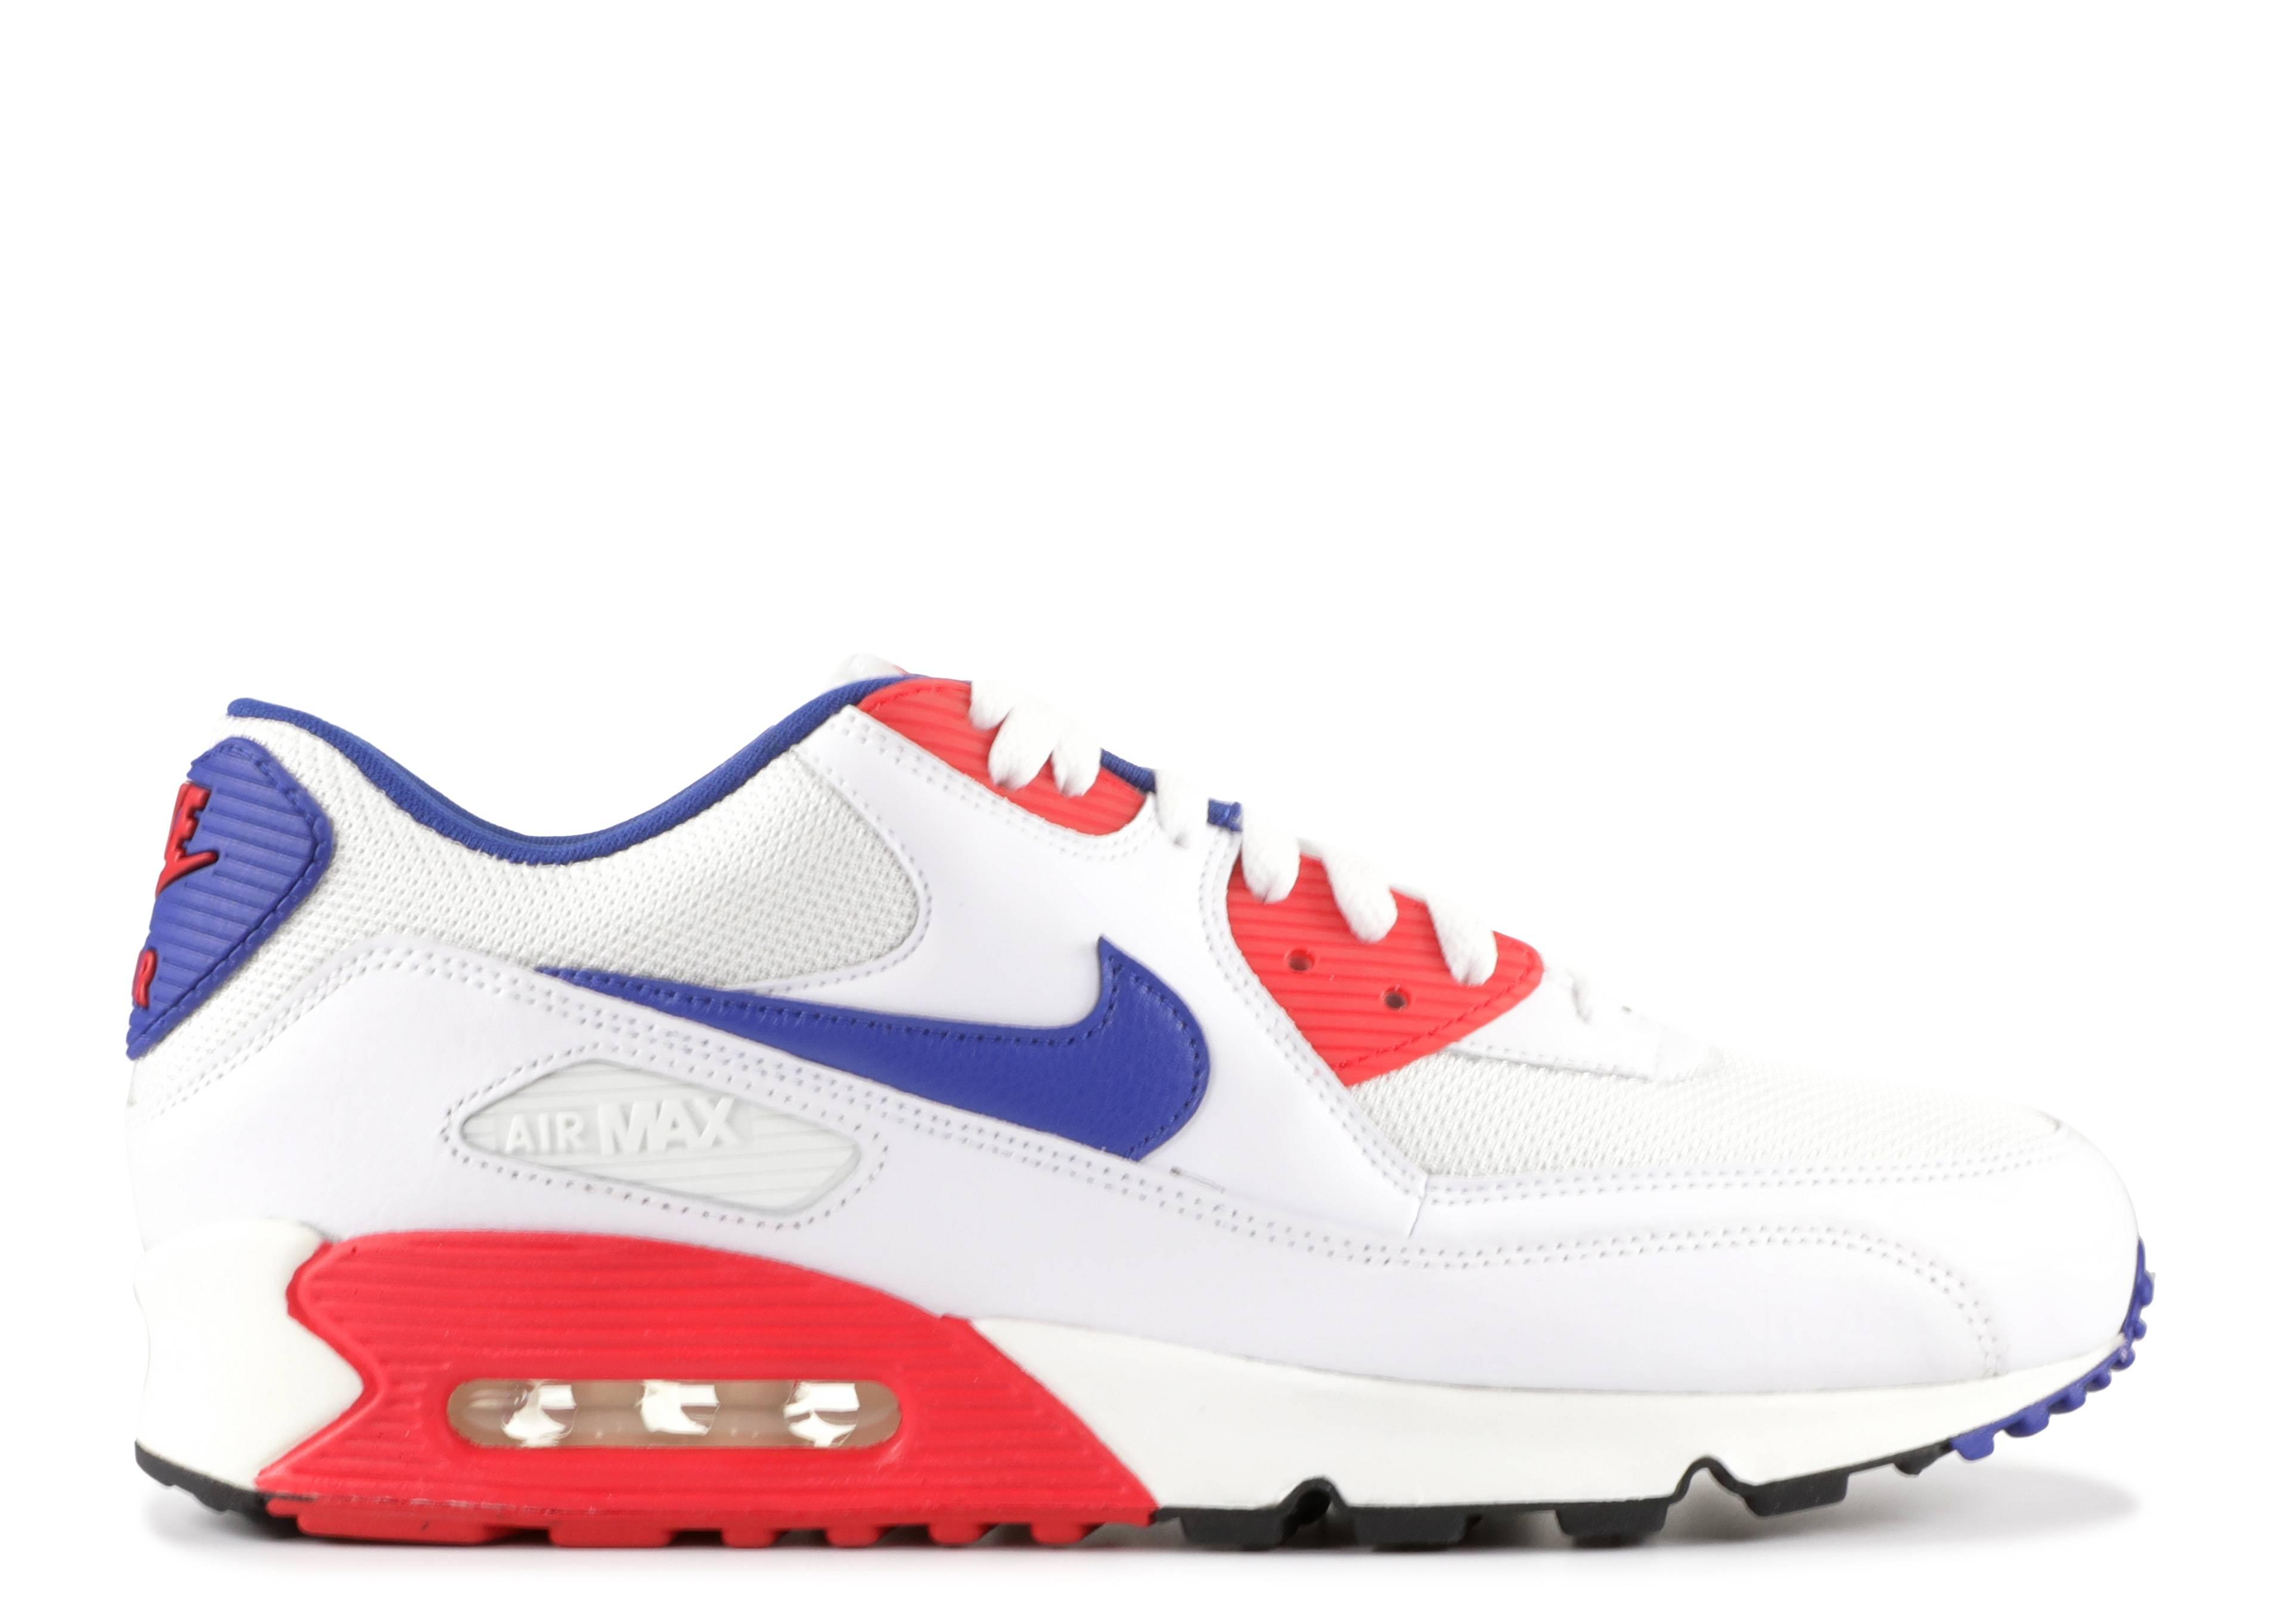 brand new 6e2d8 1cd7d Nike Air Max 90 Essential - Nike - 537384 146 - white hyper blue-hyper red- white   Flight Club